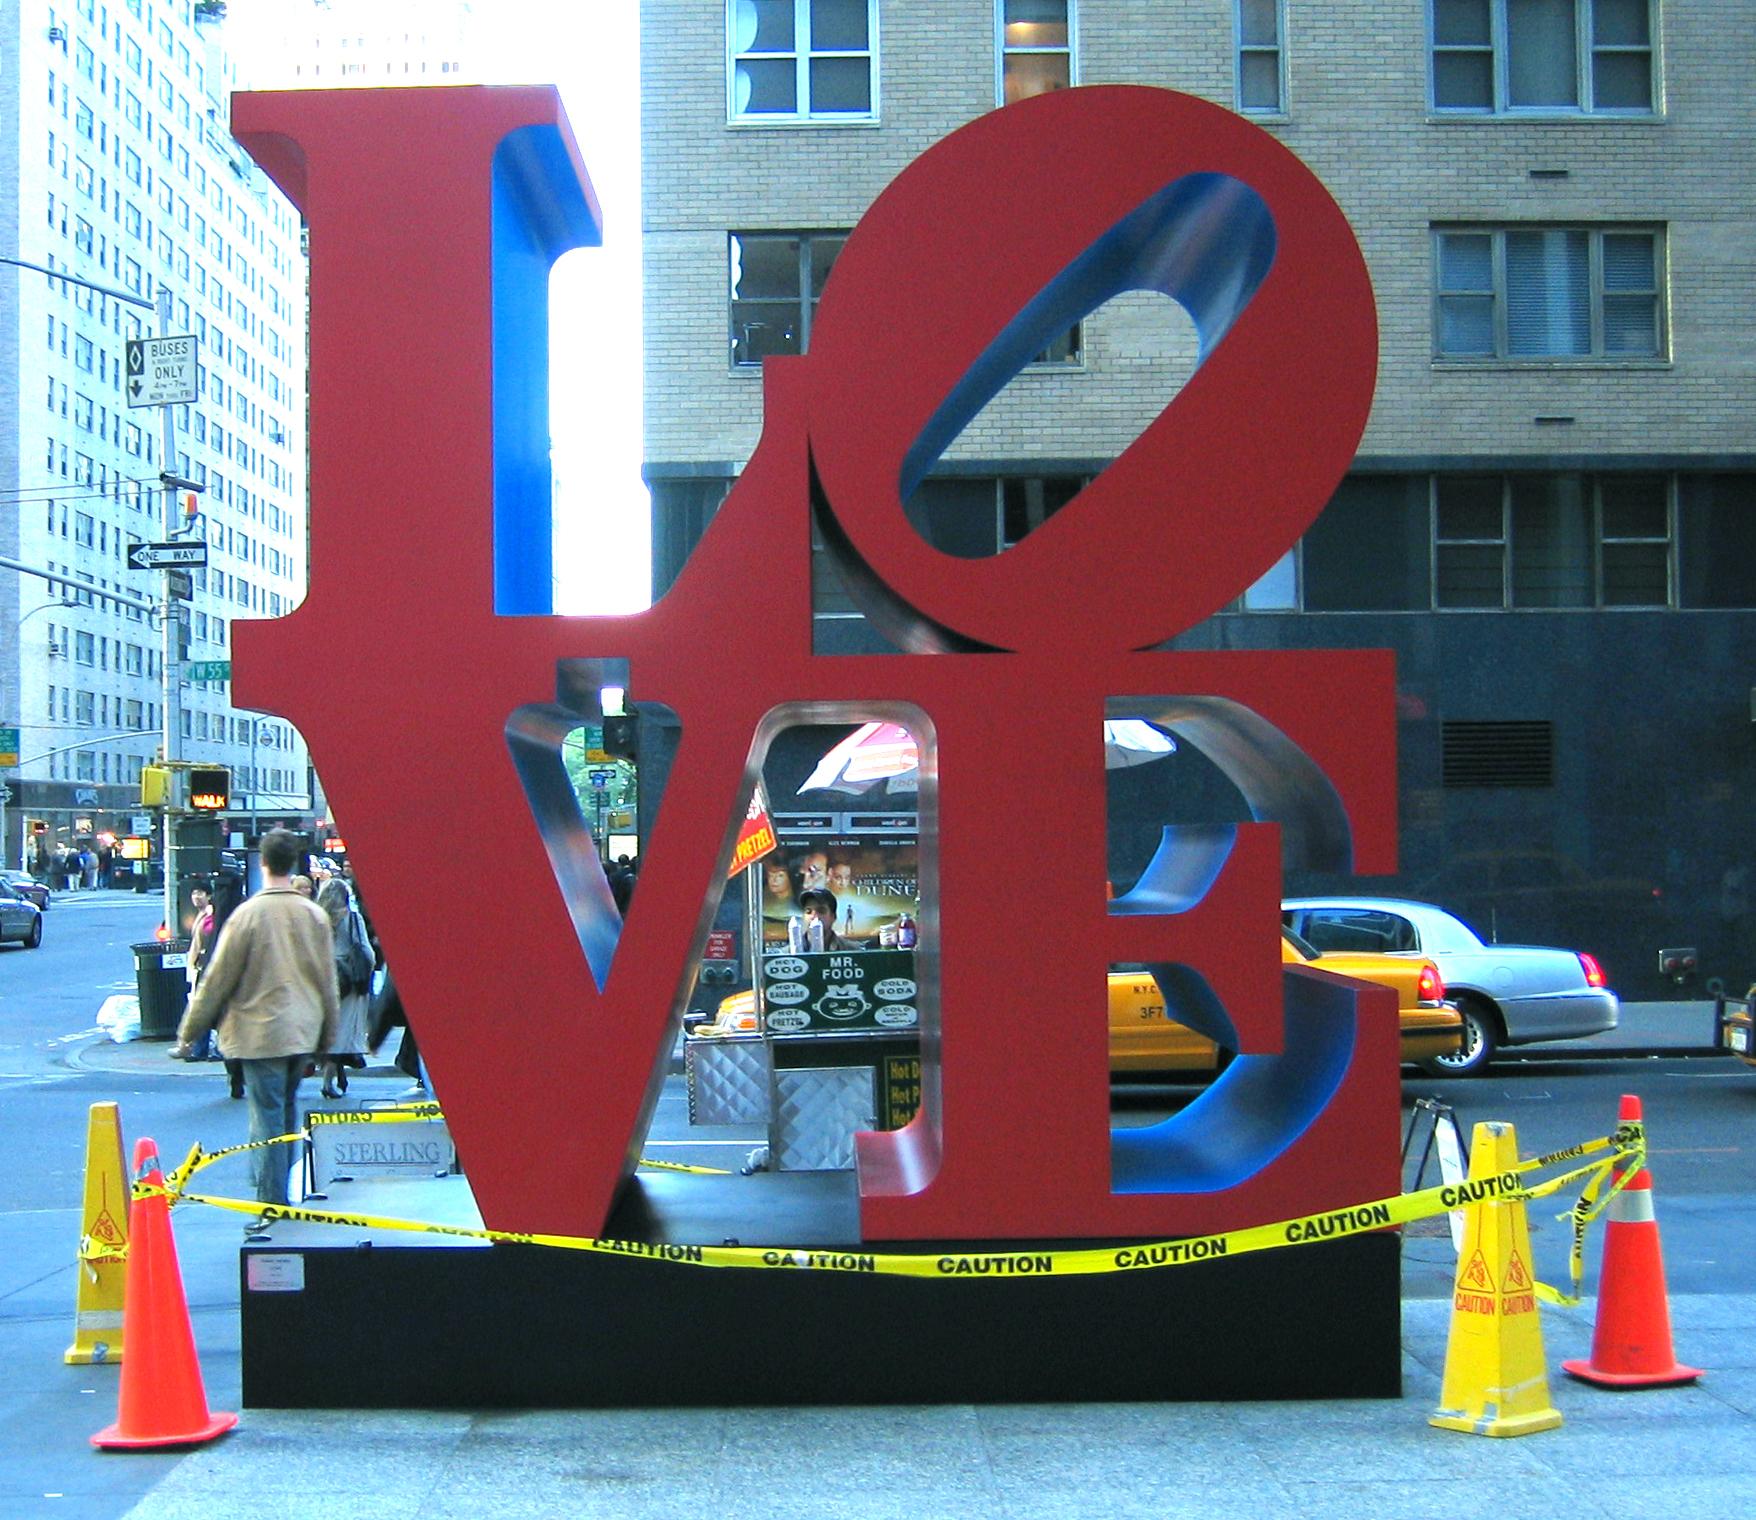 Caution Love!